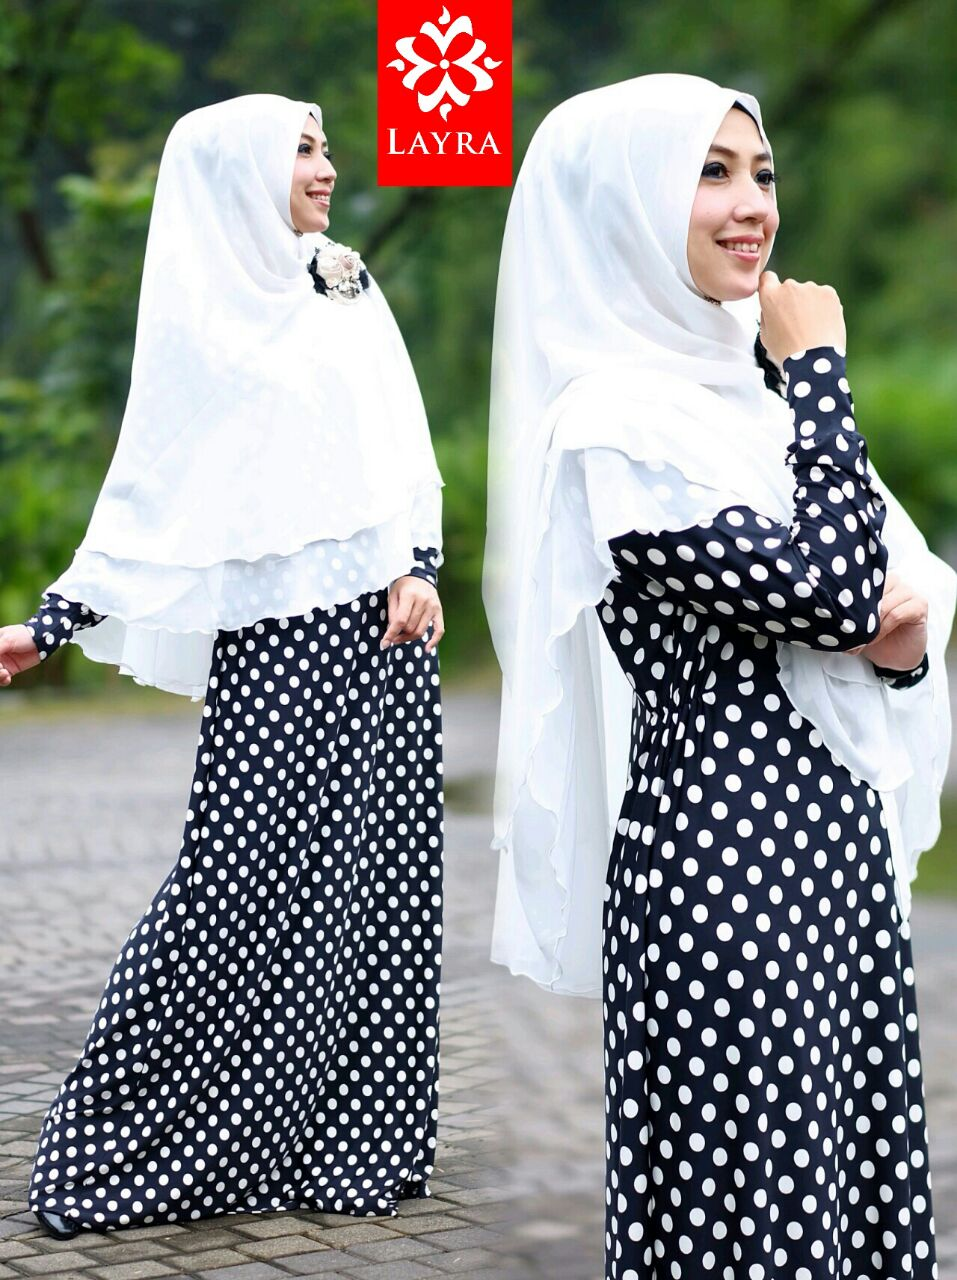 Koleksi Busana Muslim Terbaru De'key by Layra Hitam